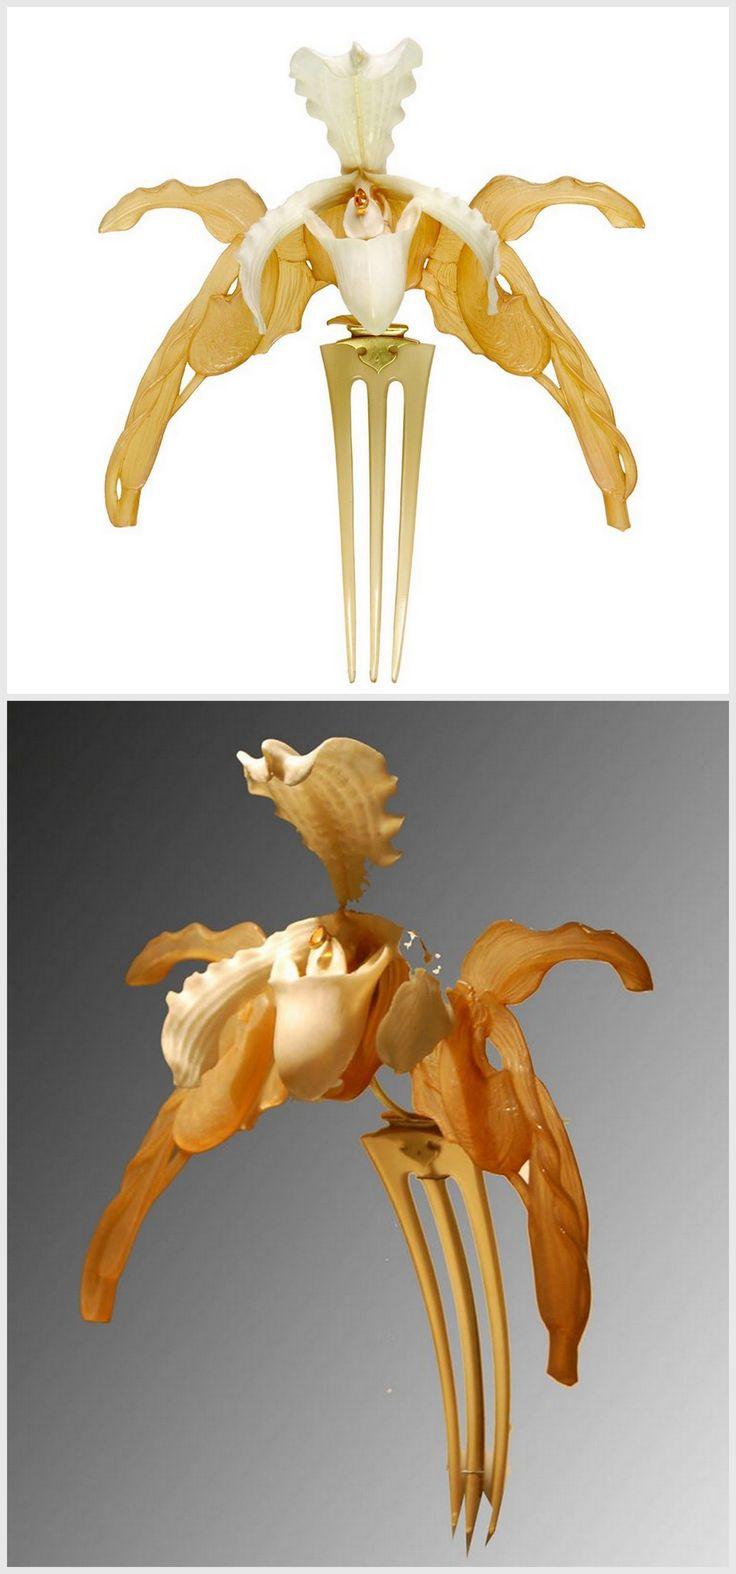 "René Lalique - ""Orchids"" diadem 1903-1904. Horn, ivory, gold and citrine. | © Museu Calouste Gulbenkian"